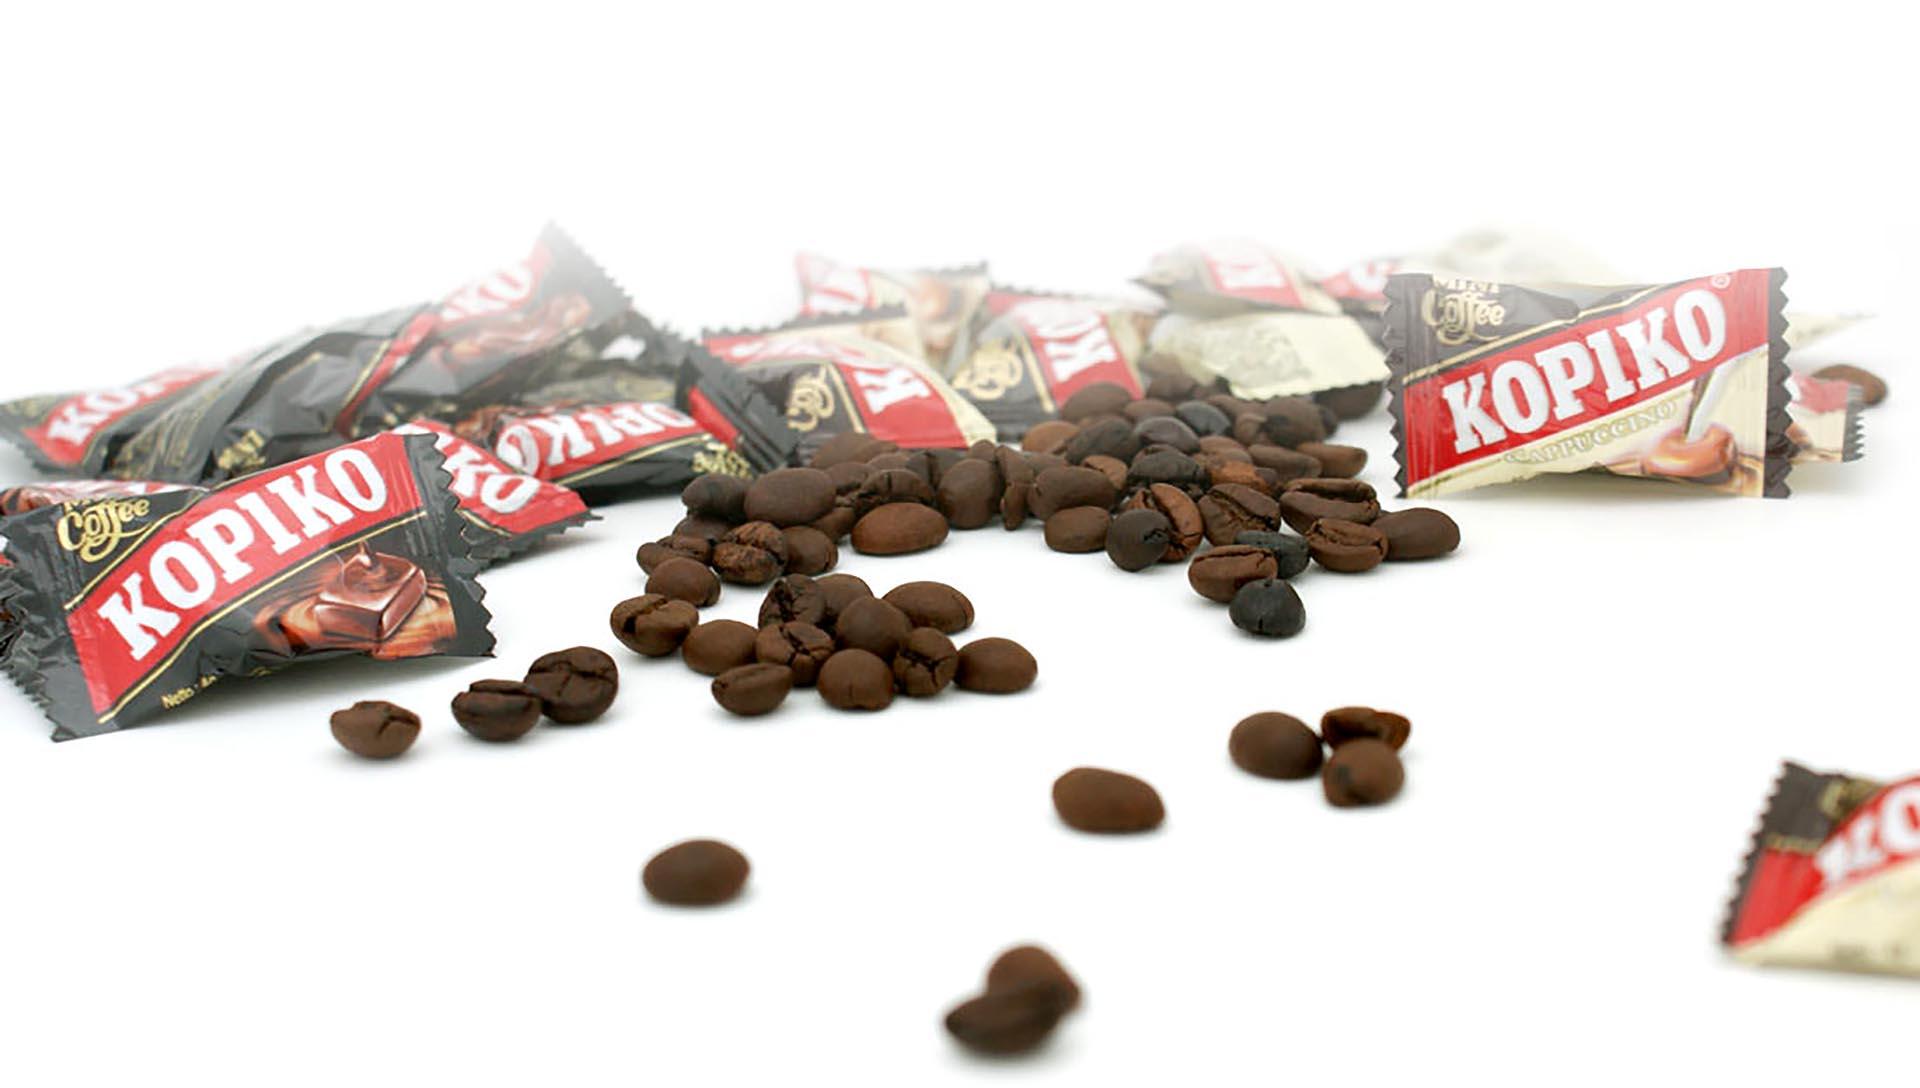 gerio-kopiko-coffee-candy-gallery